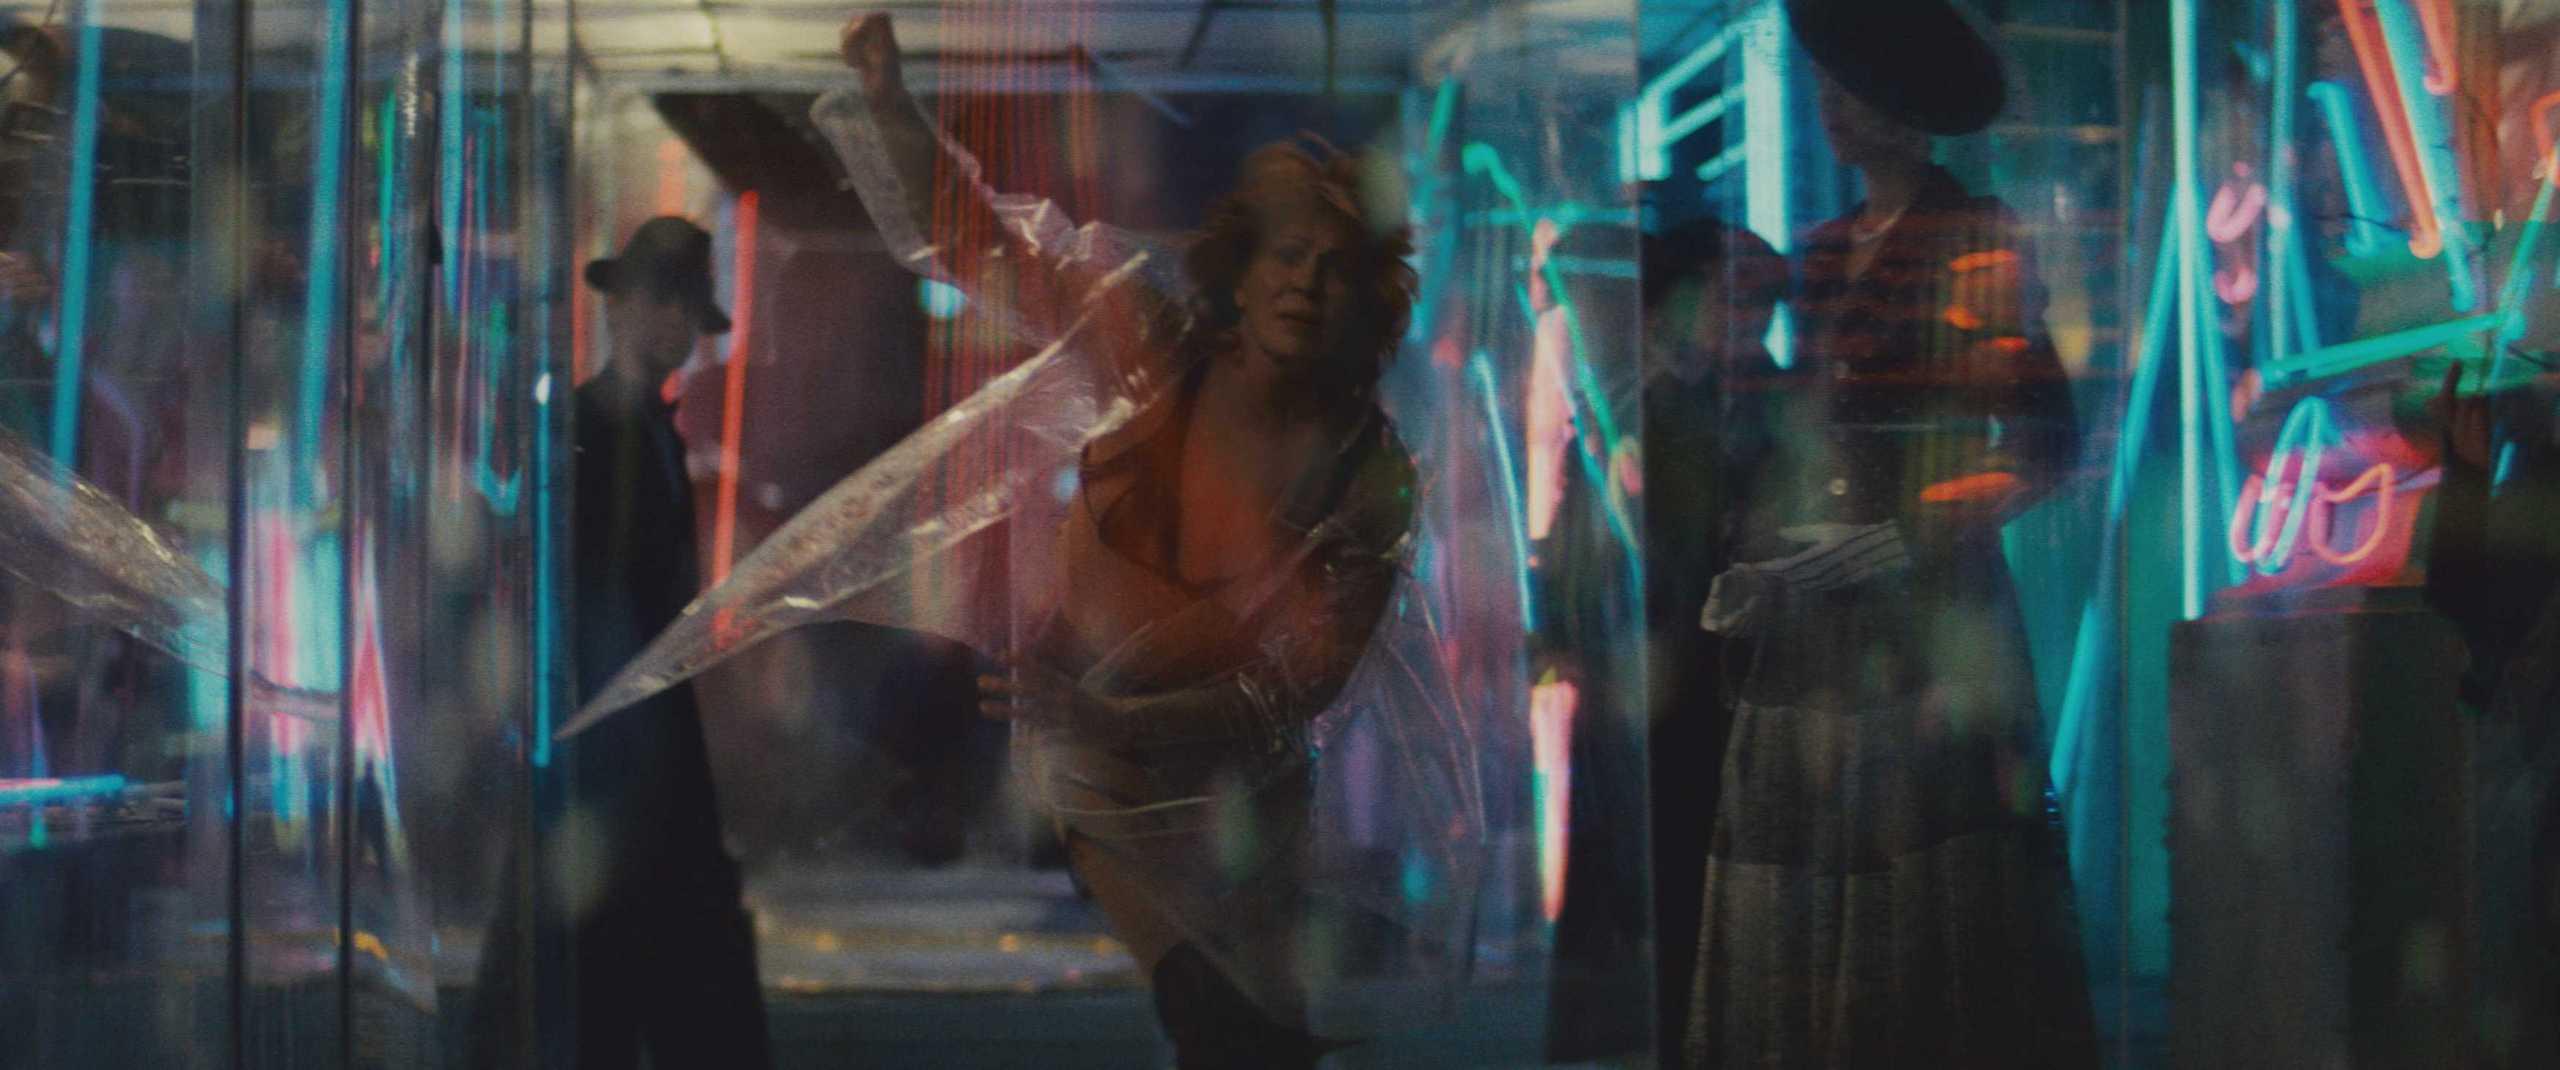 Home Design Lover Facebook Joanna Cassidy As Zhora In Blade Runner Blade Runner